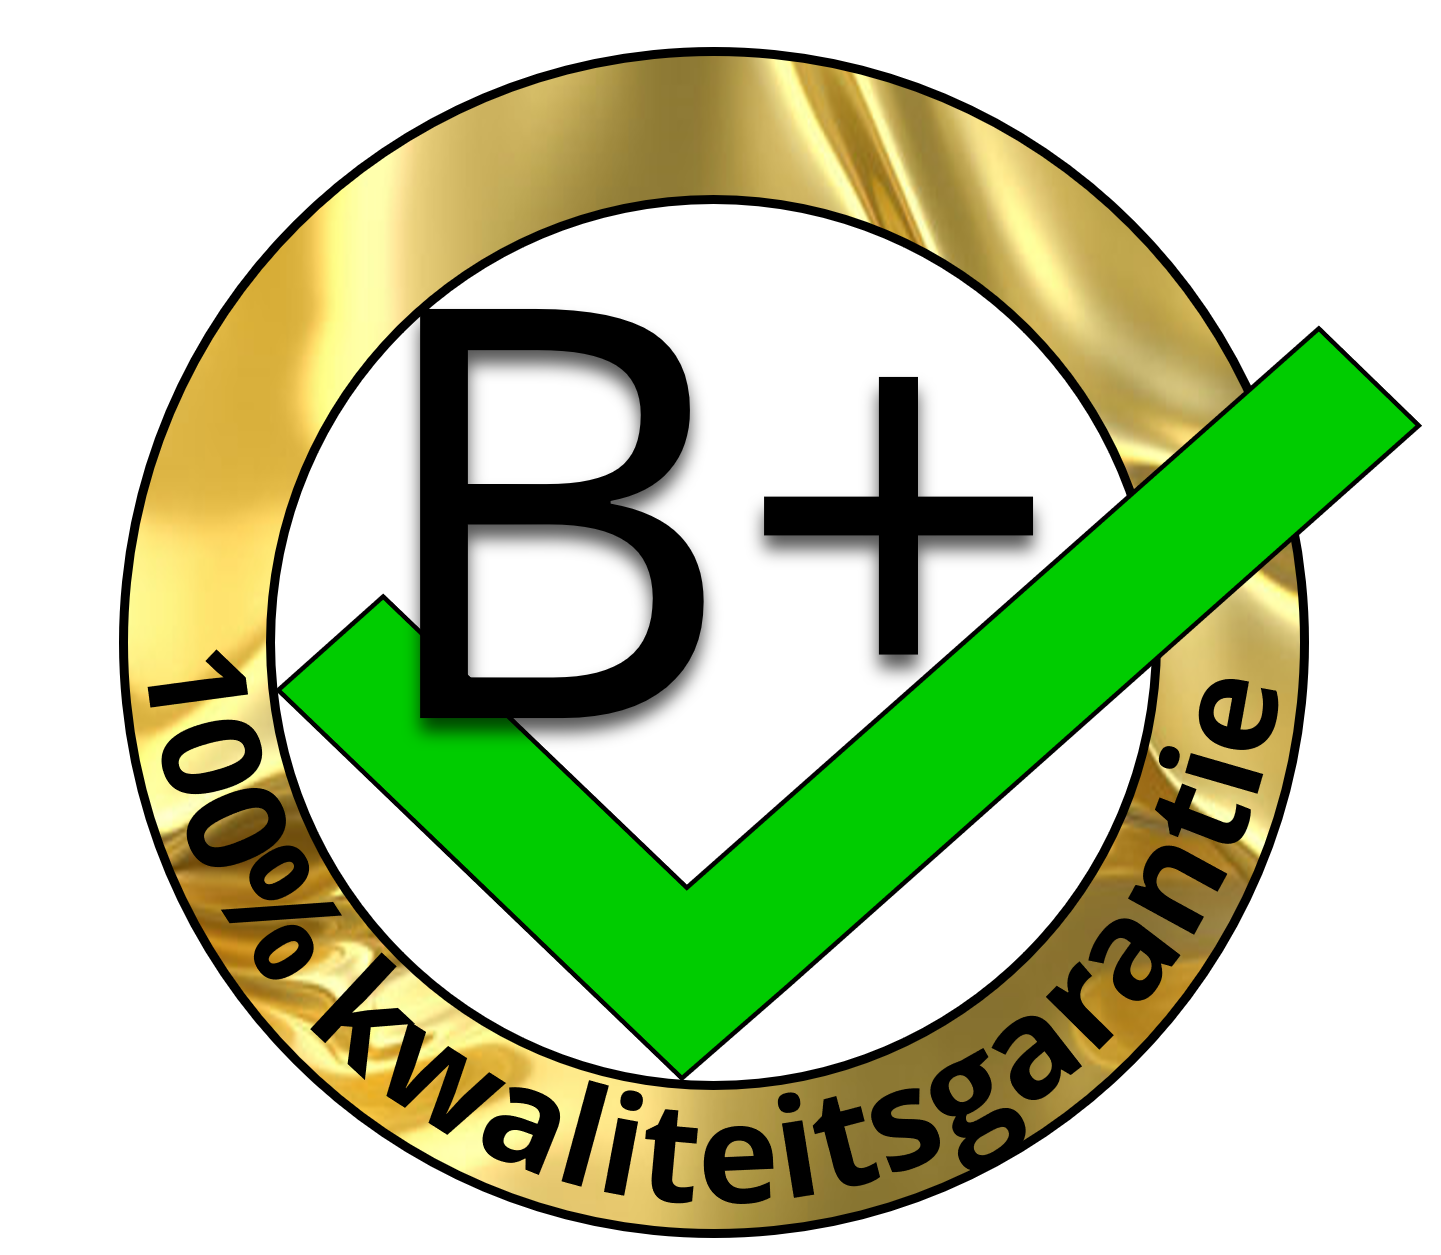 B+ kwaliteit